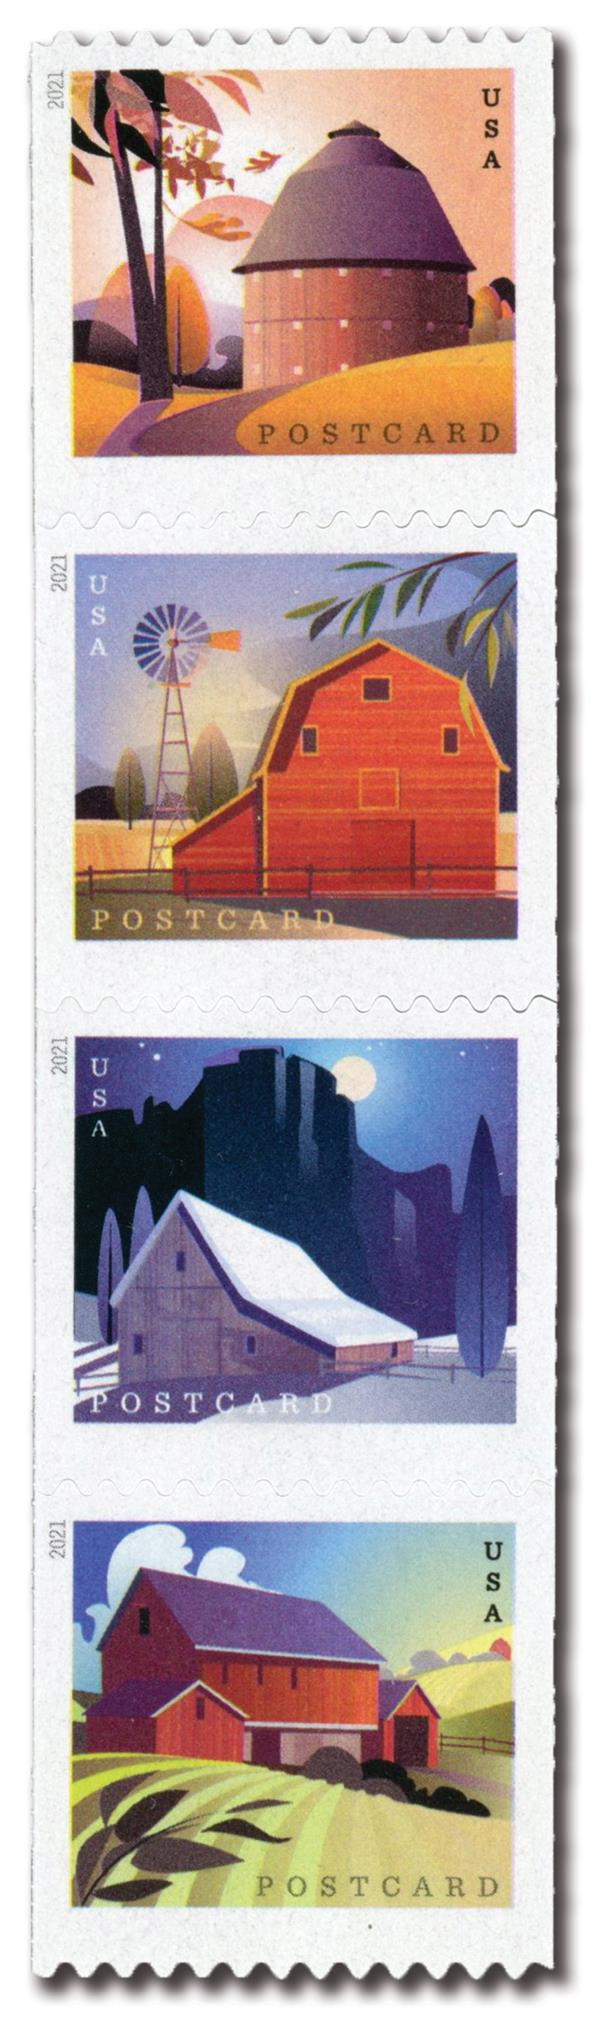 2021 Barns postcard rate stamps